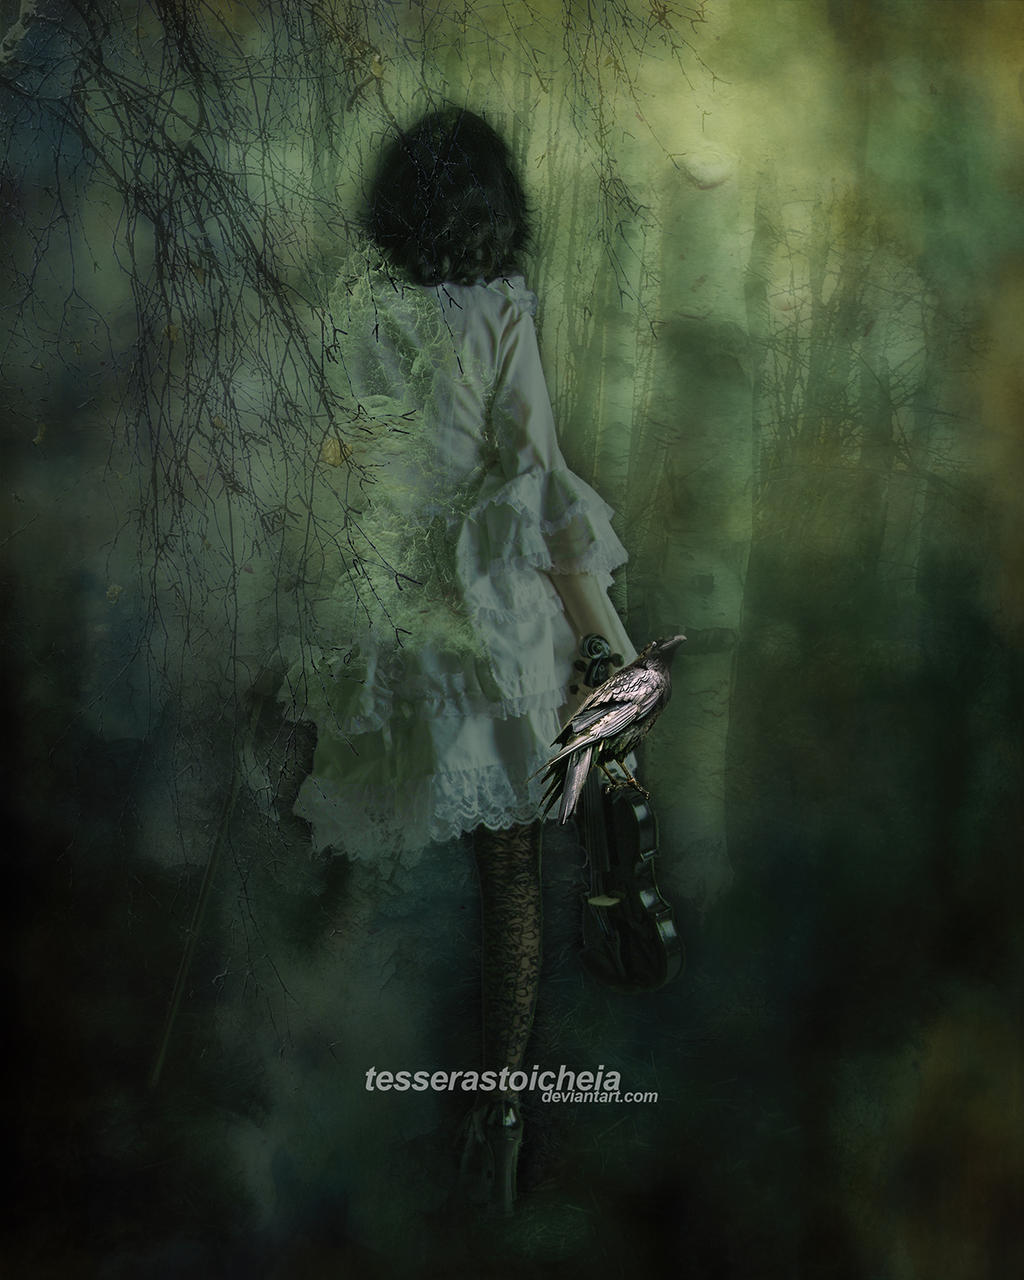 Scream In The Birch Forest